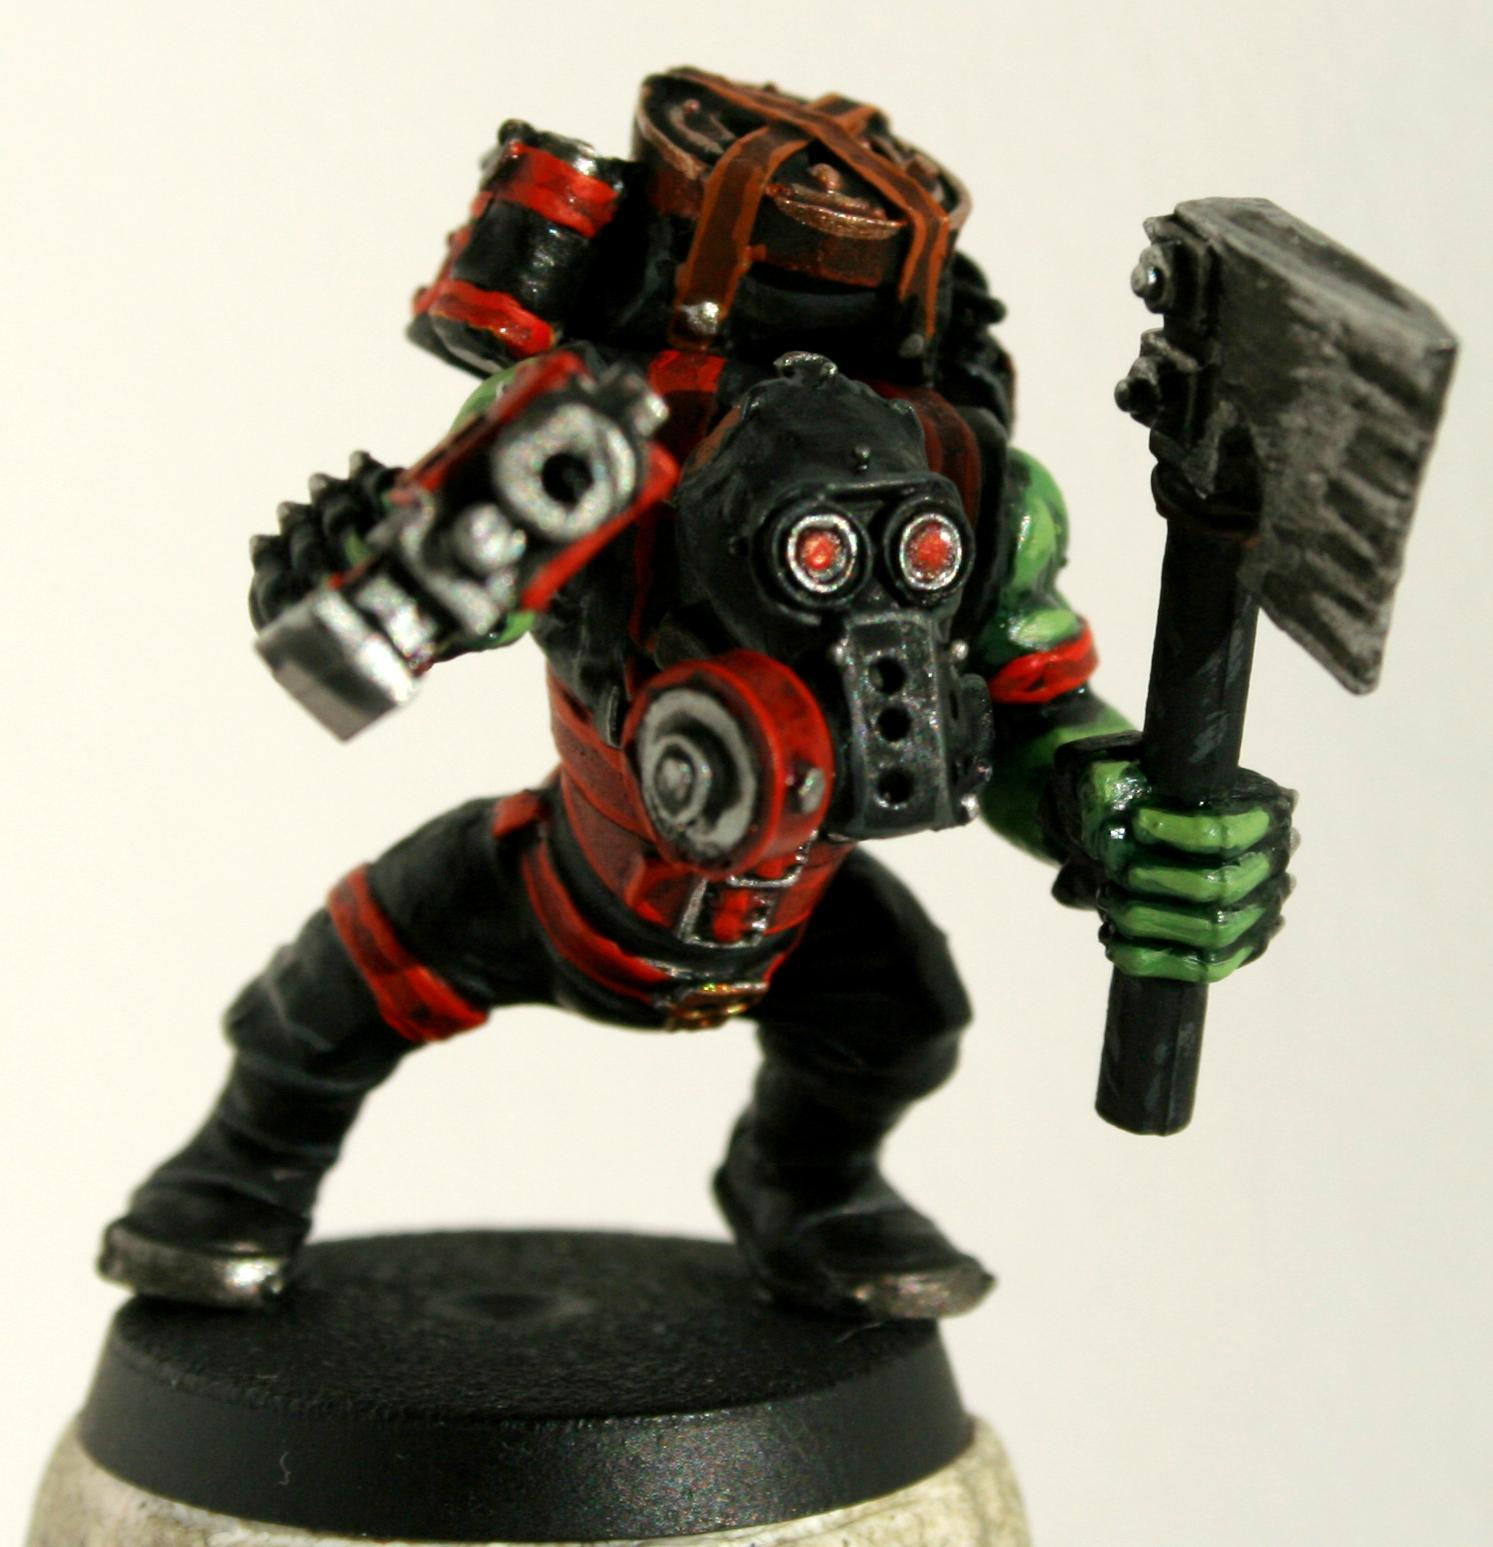 Black, Dynamite, Forge World, Gas Mask, Kommando, Kommandos, Ork Kommando, Orks